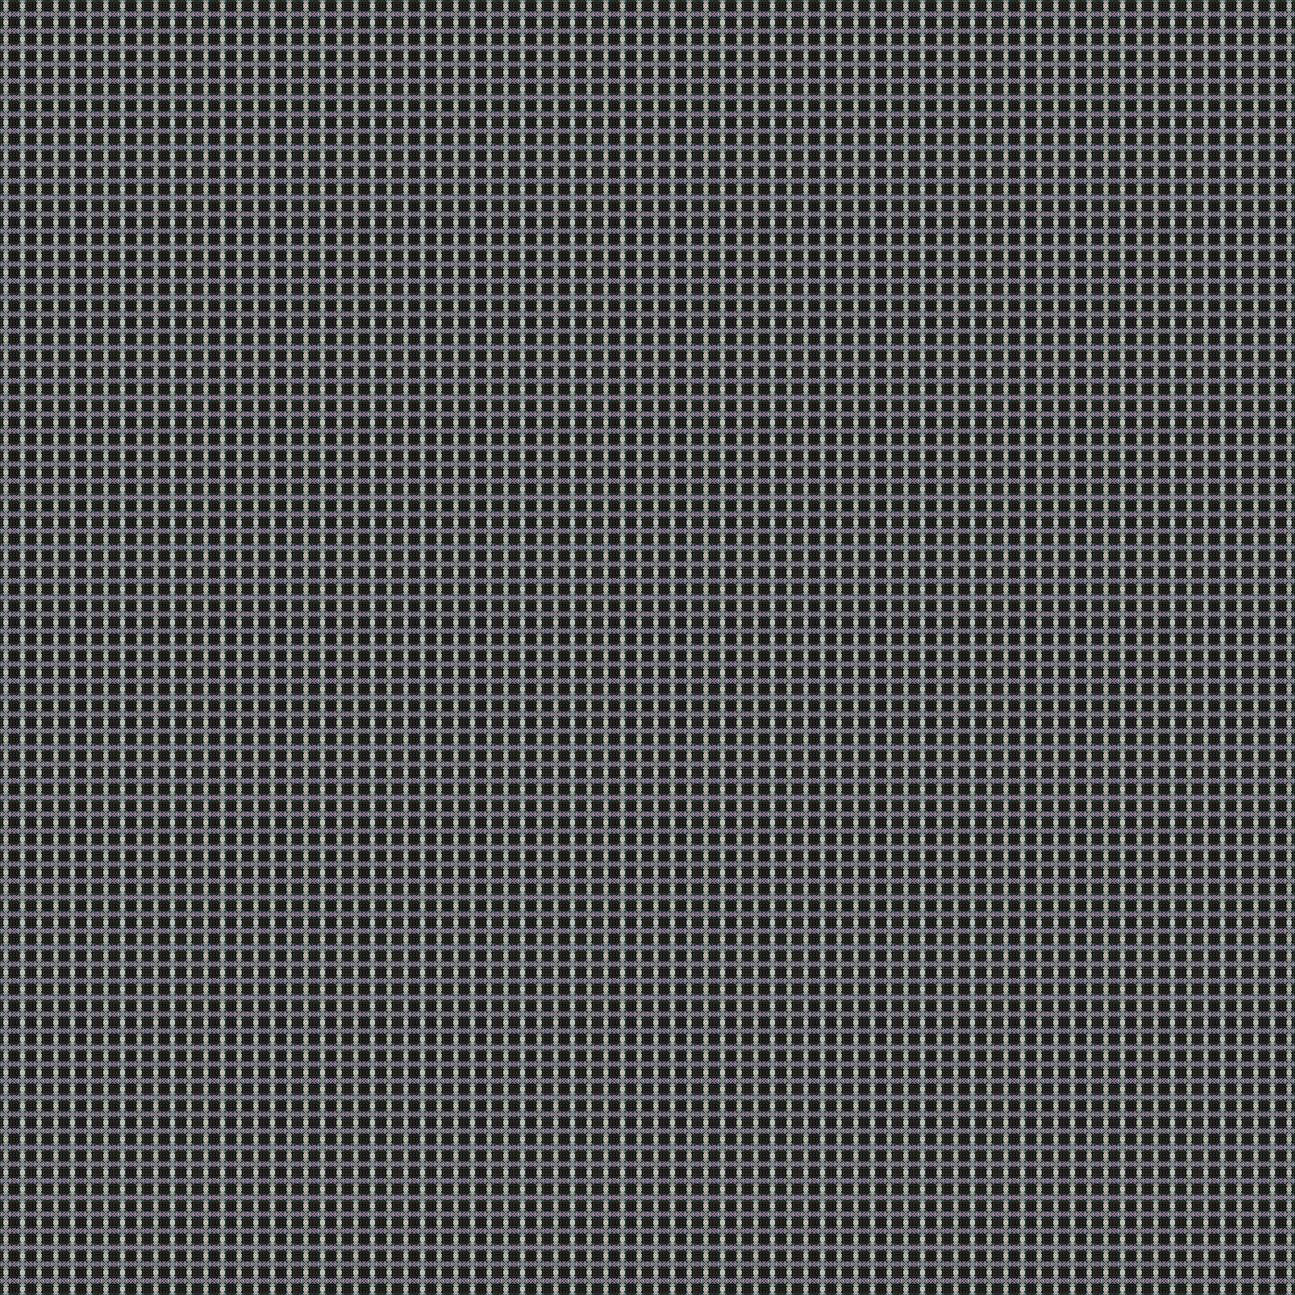 4up-grid1295-1.jpg